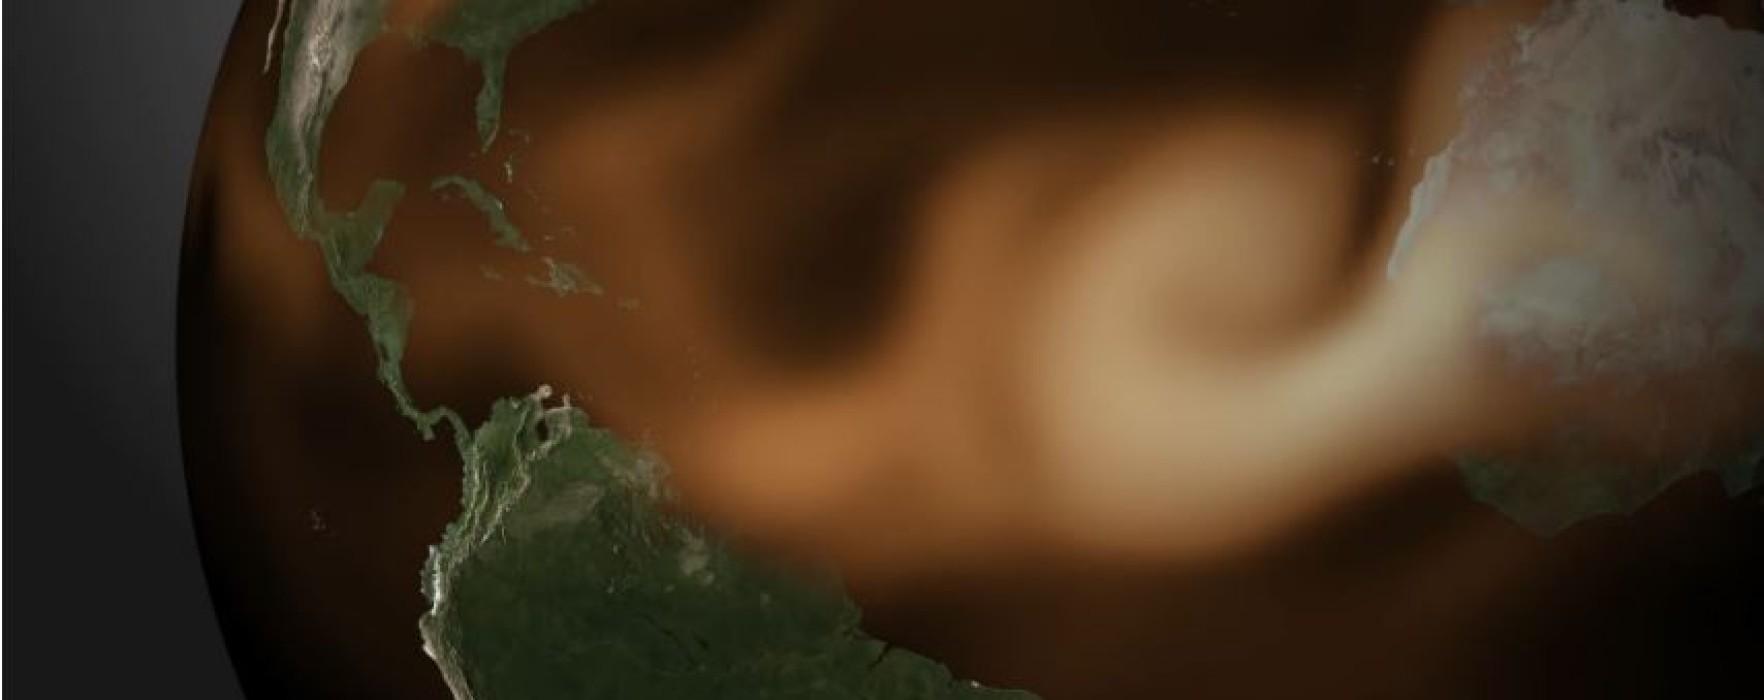 African ram ai laivut nawi Atlantic vum ah dim